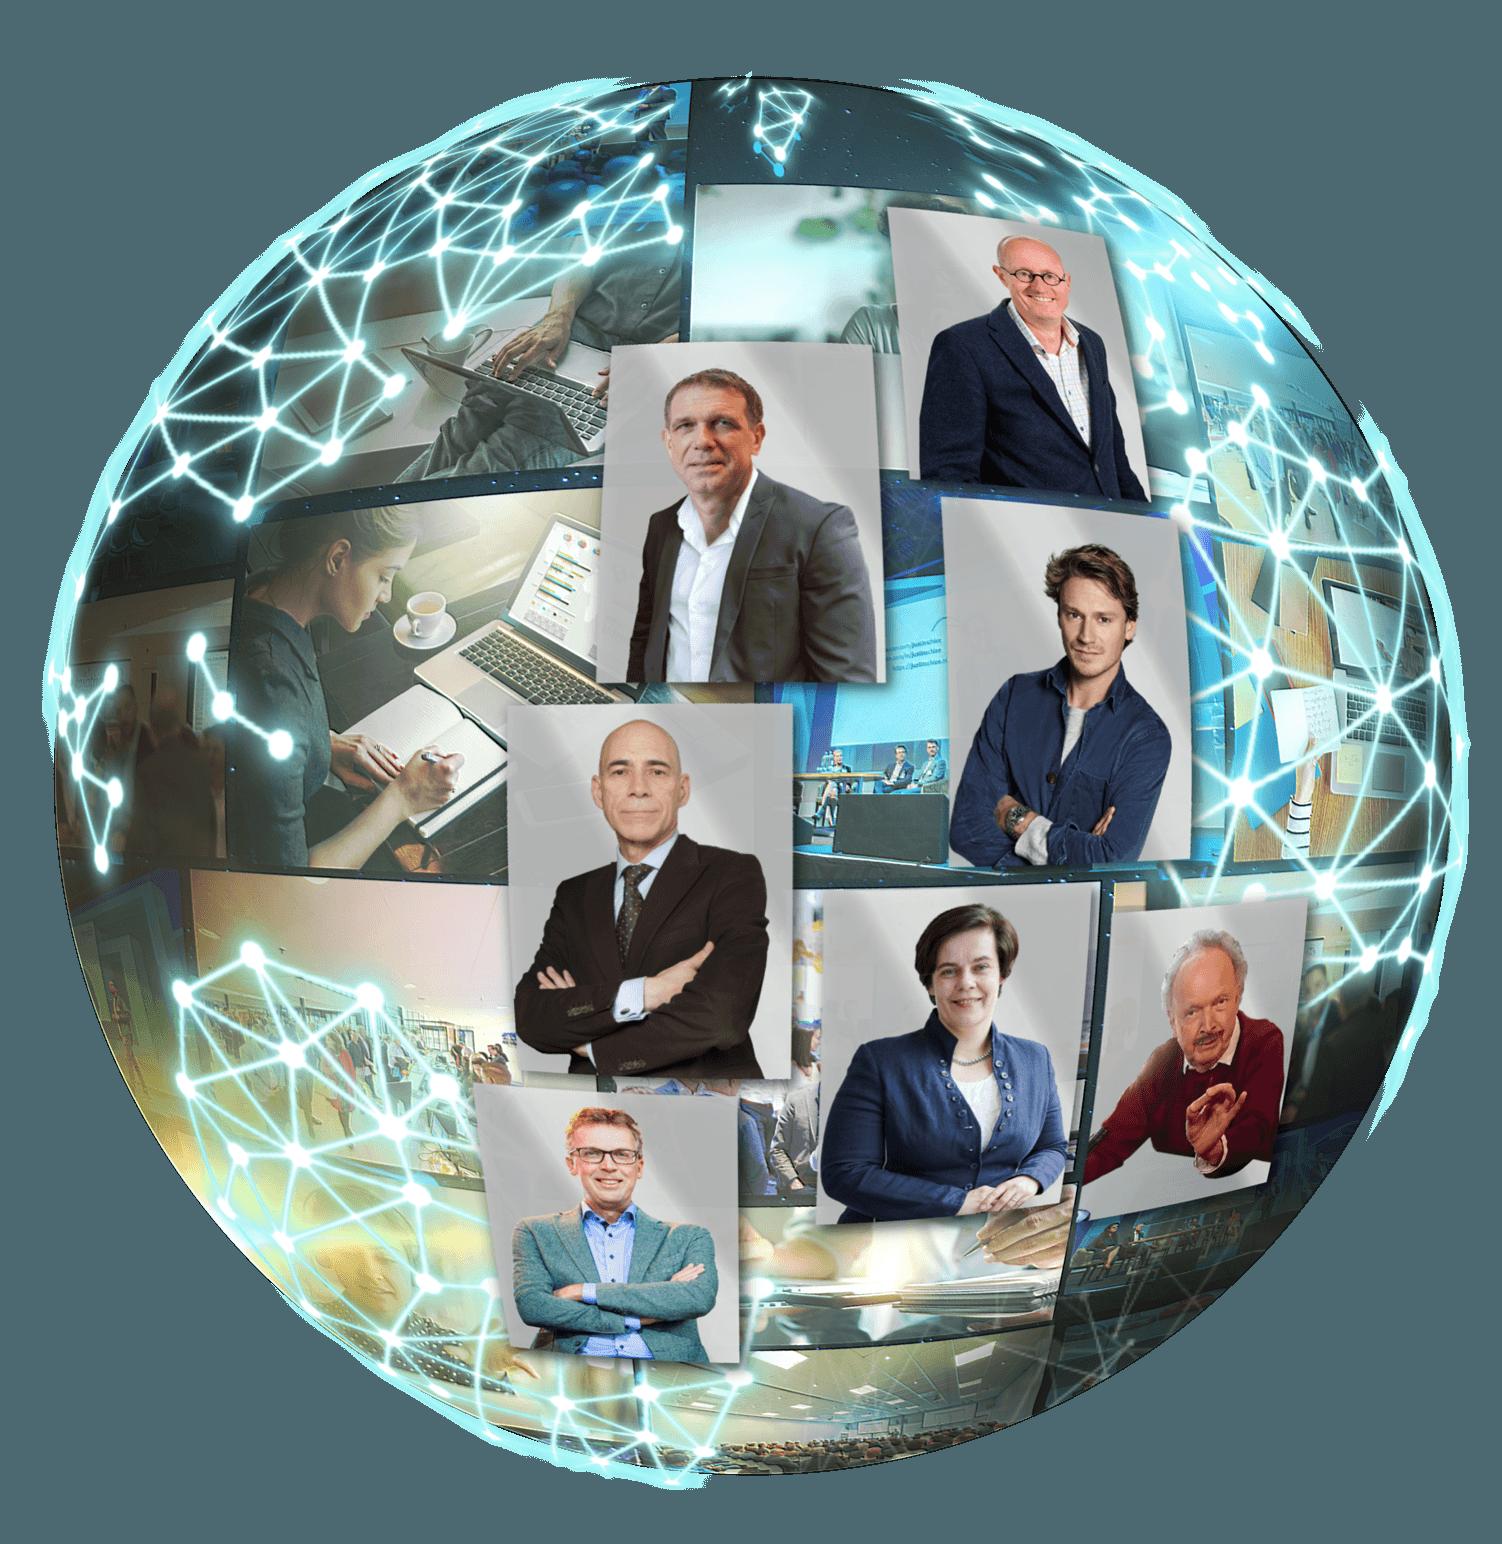 wereldbol_plenair